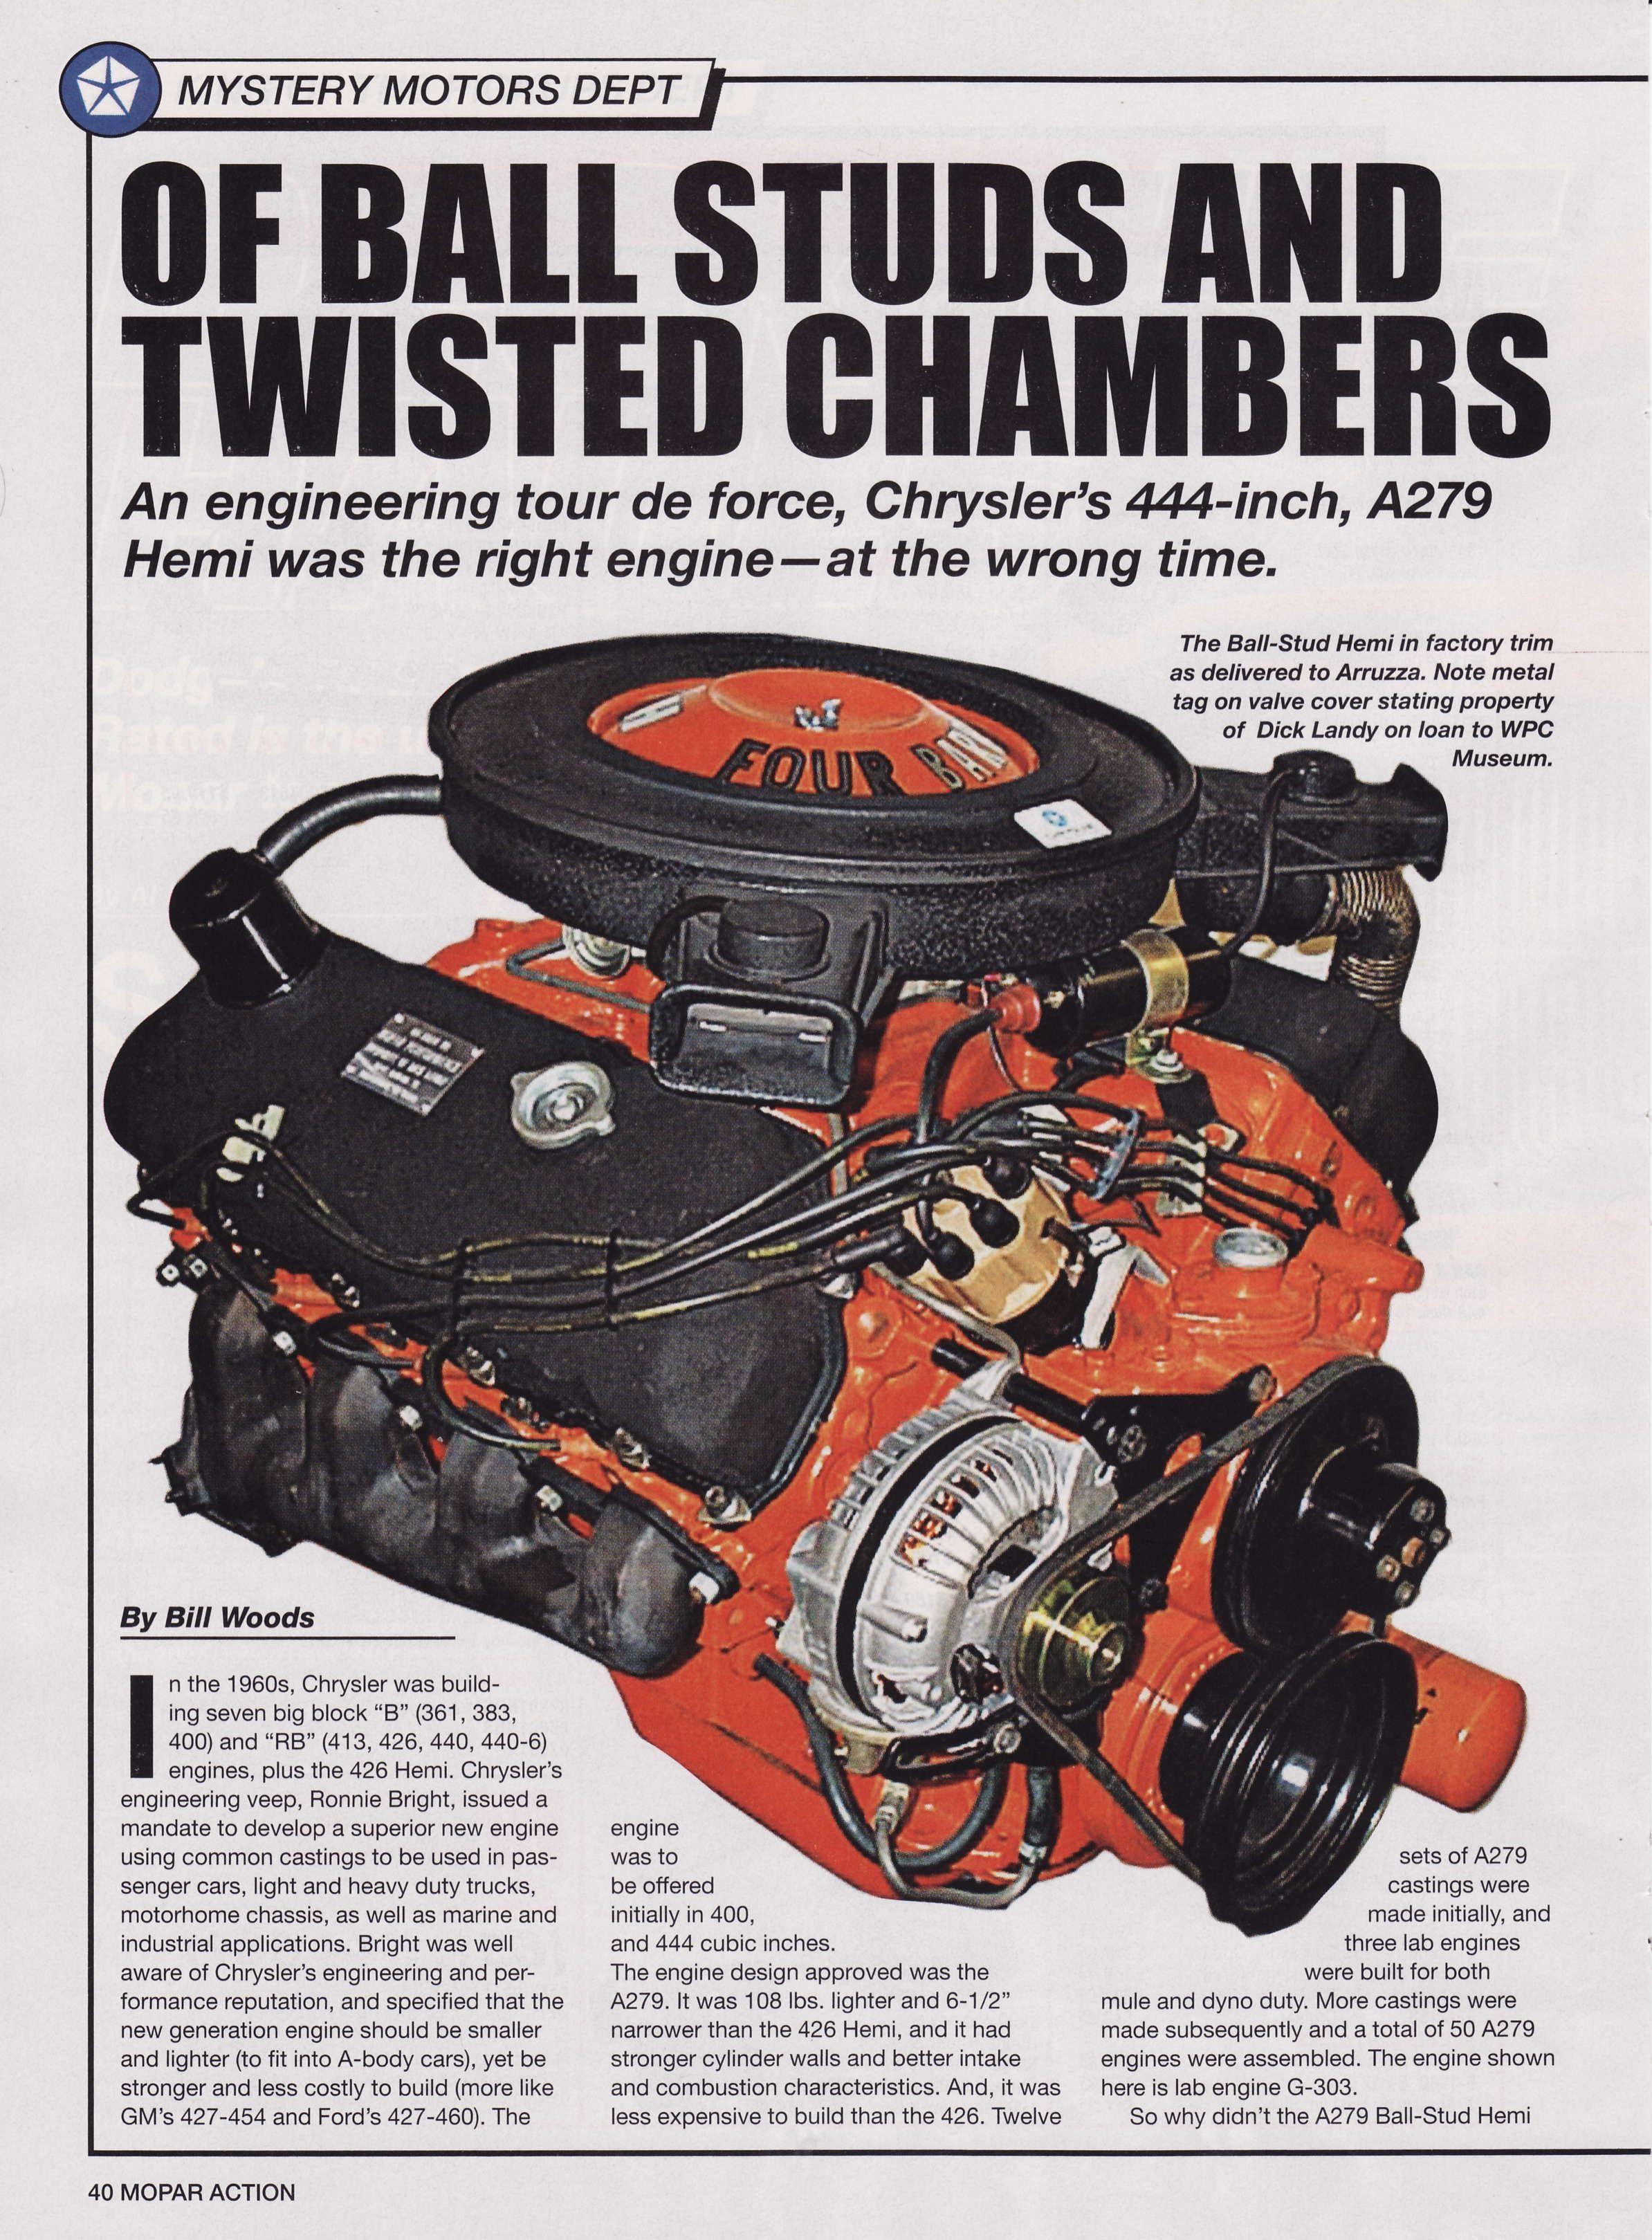 Chrysler's Ball-Stud Hemi V-8 - Page 1 | Dodge Demon's | Hemi engine